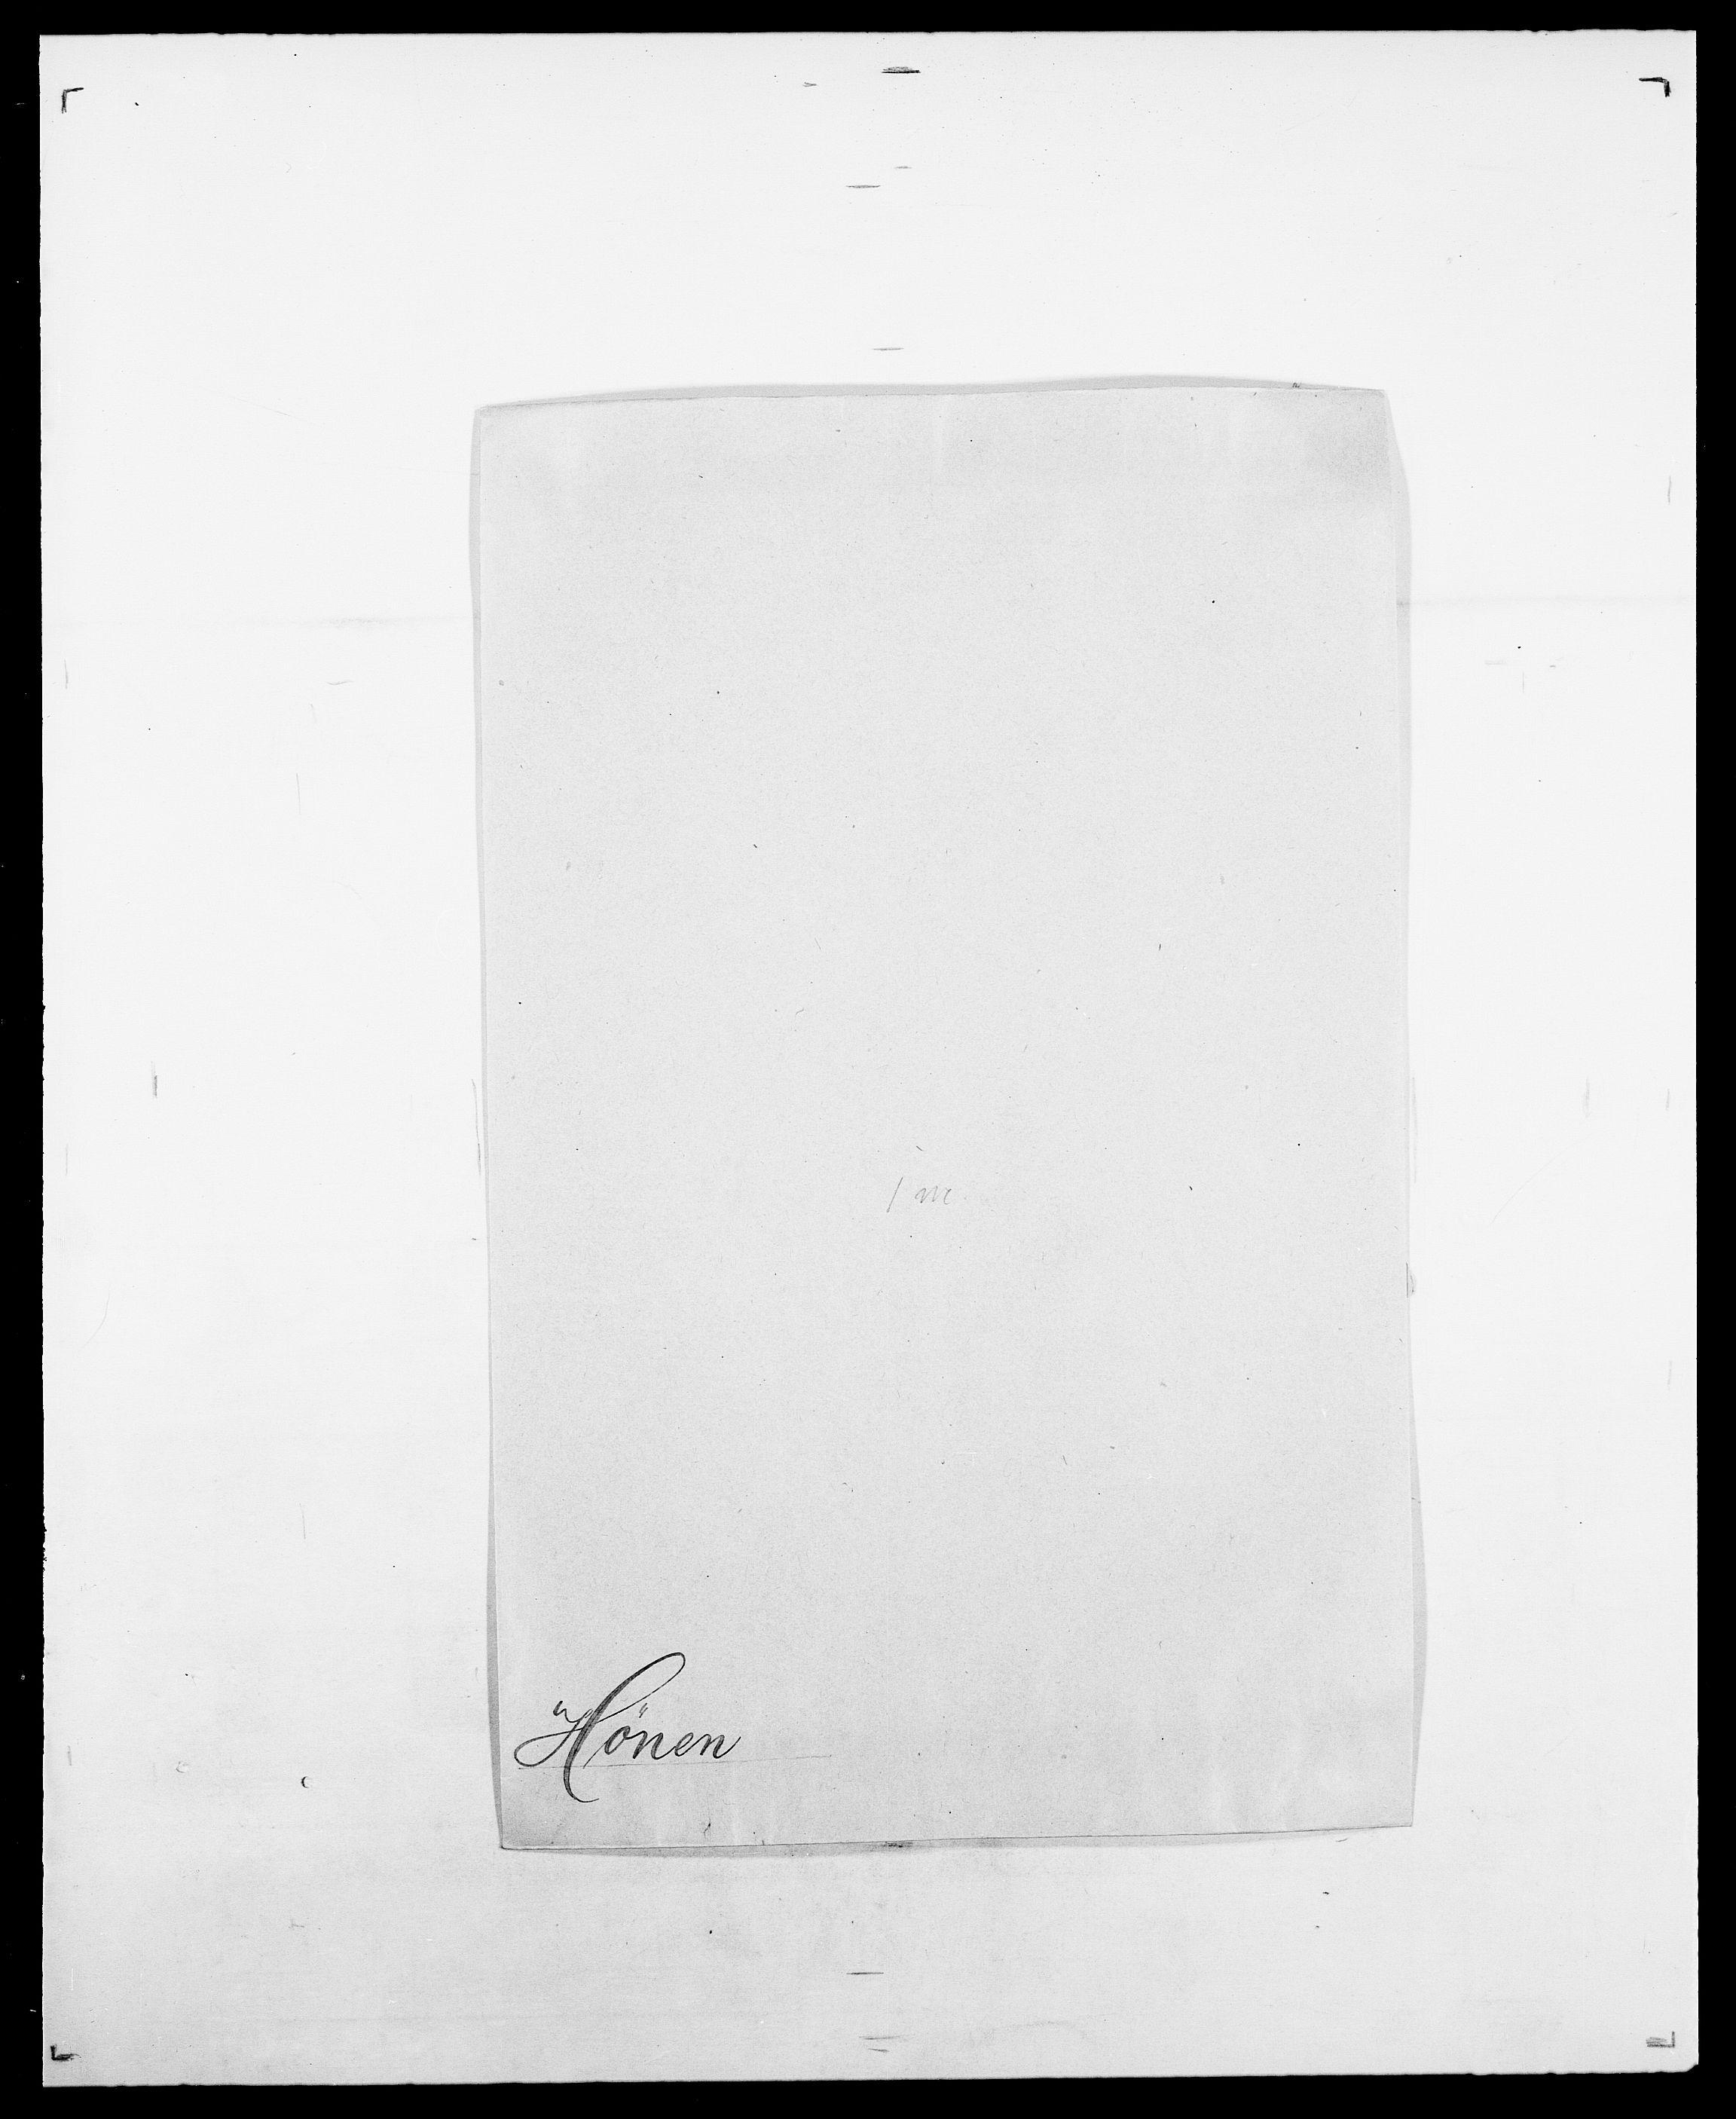 SAO, Delgobe, Charles Antoine - samling, D/Da/L0019: van der Hude - Joys, s. 360